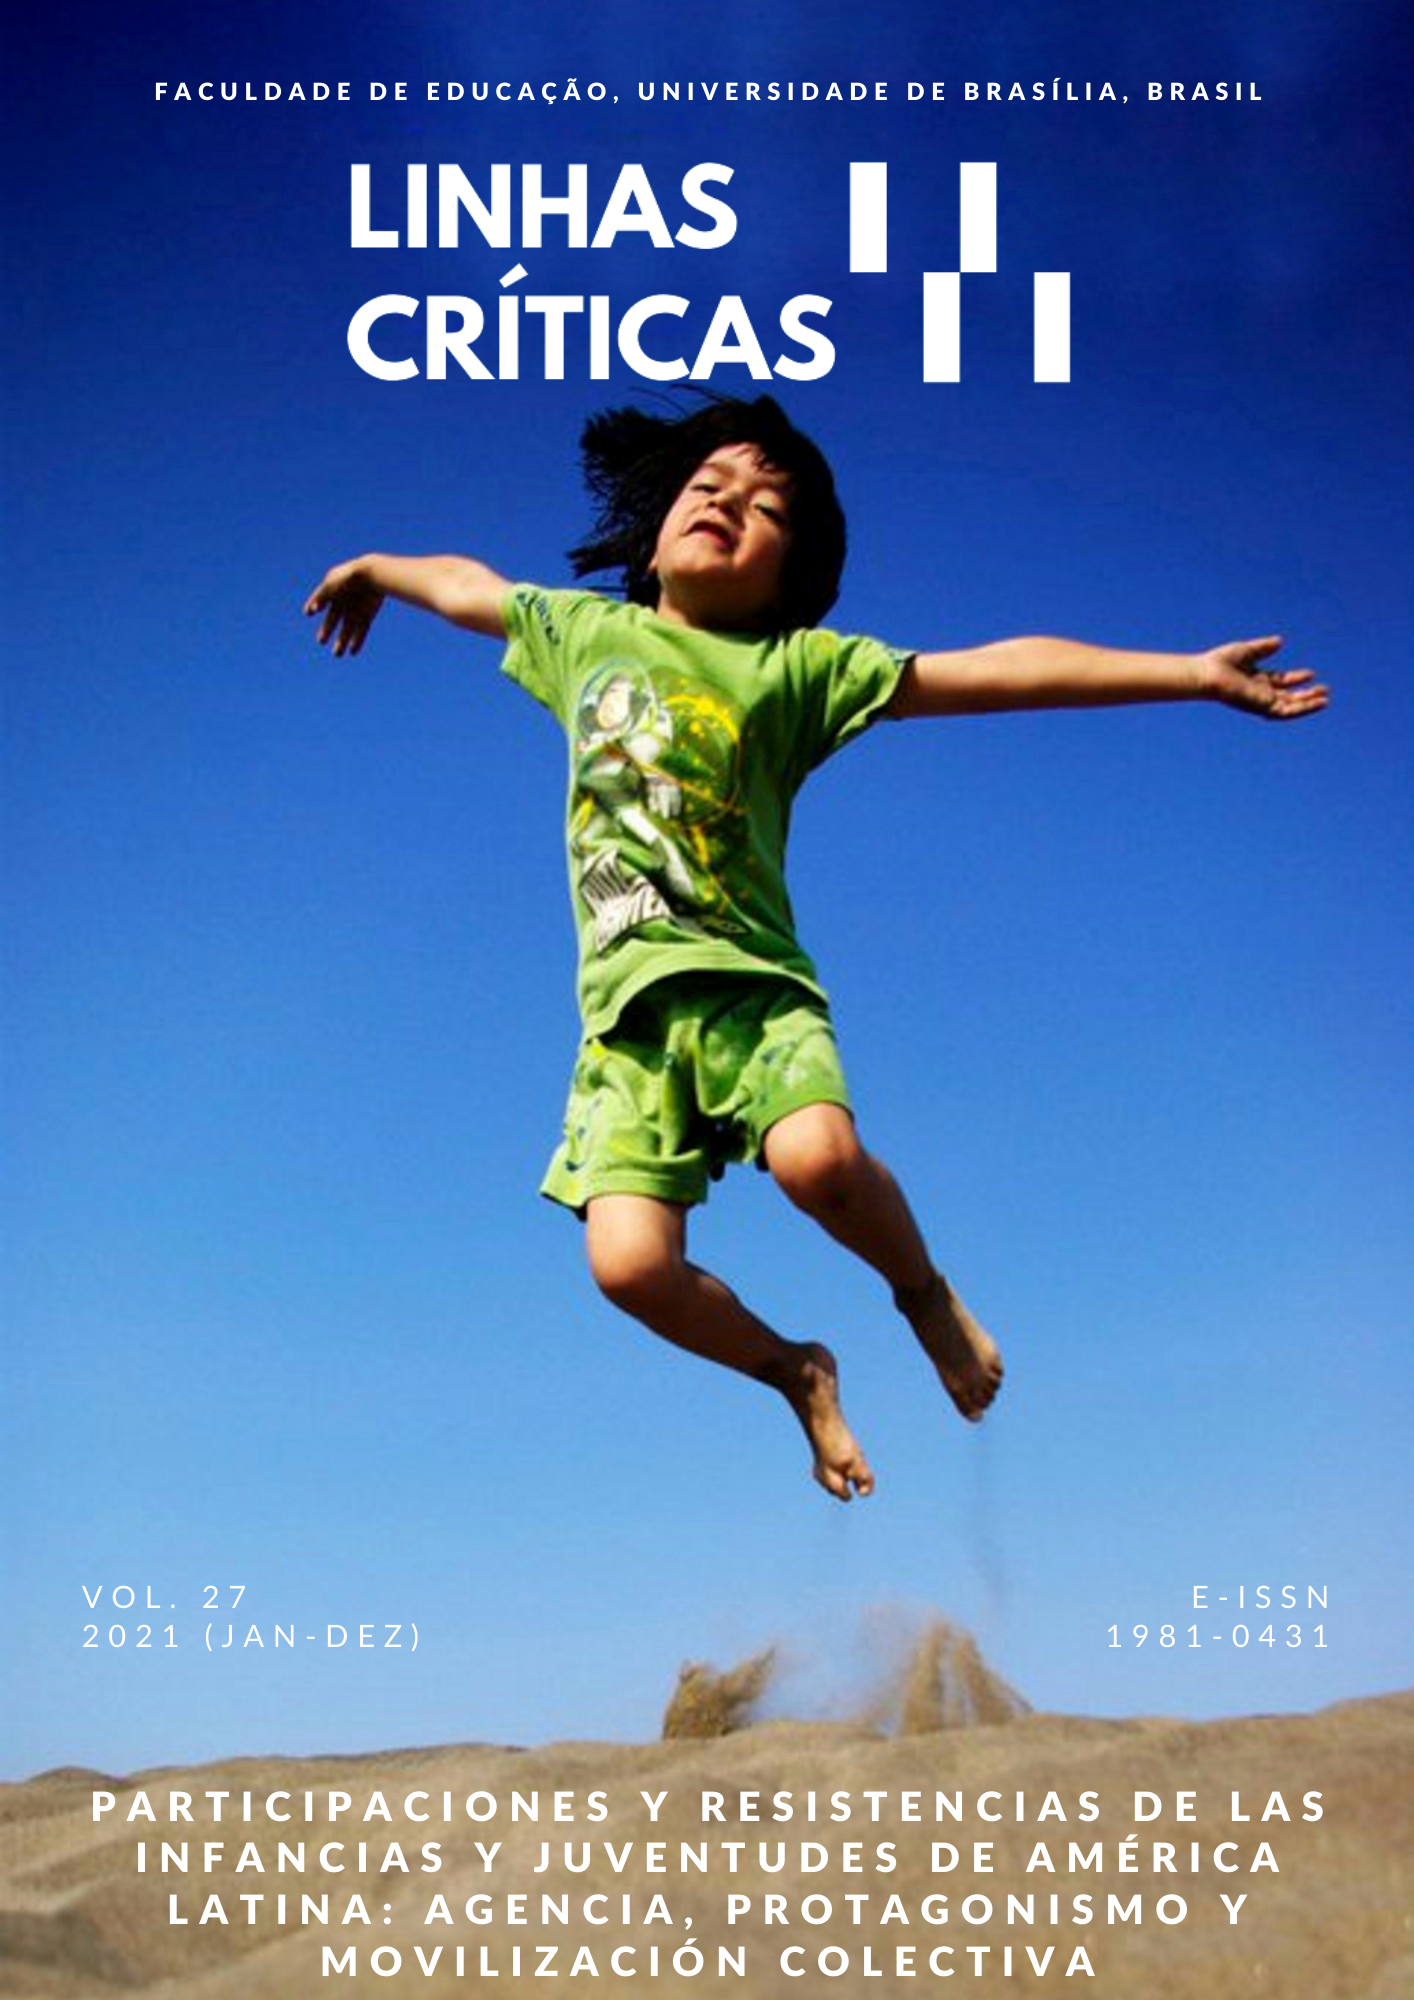 Autor: Erik Alí Castillo Cerecedo. Licença CC BY-NC-ND 4.0